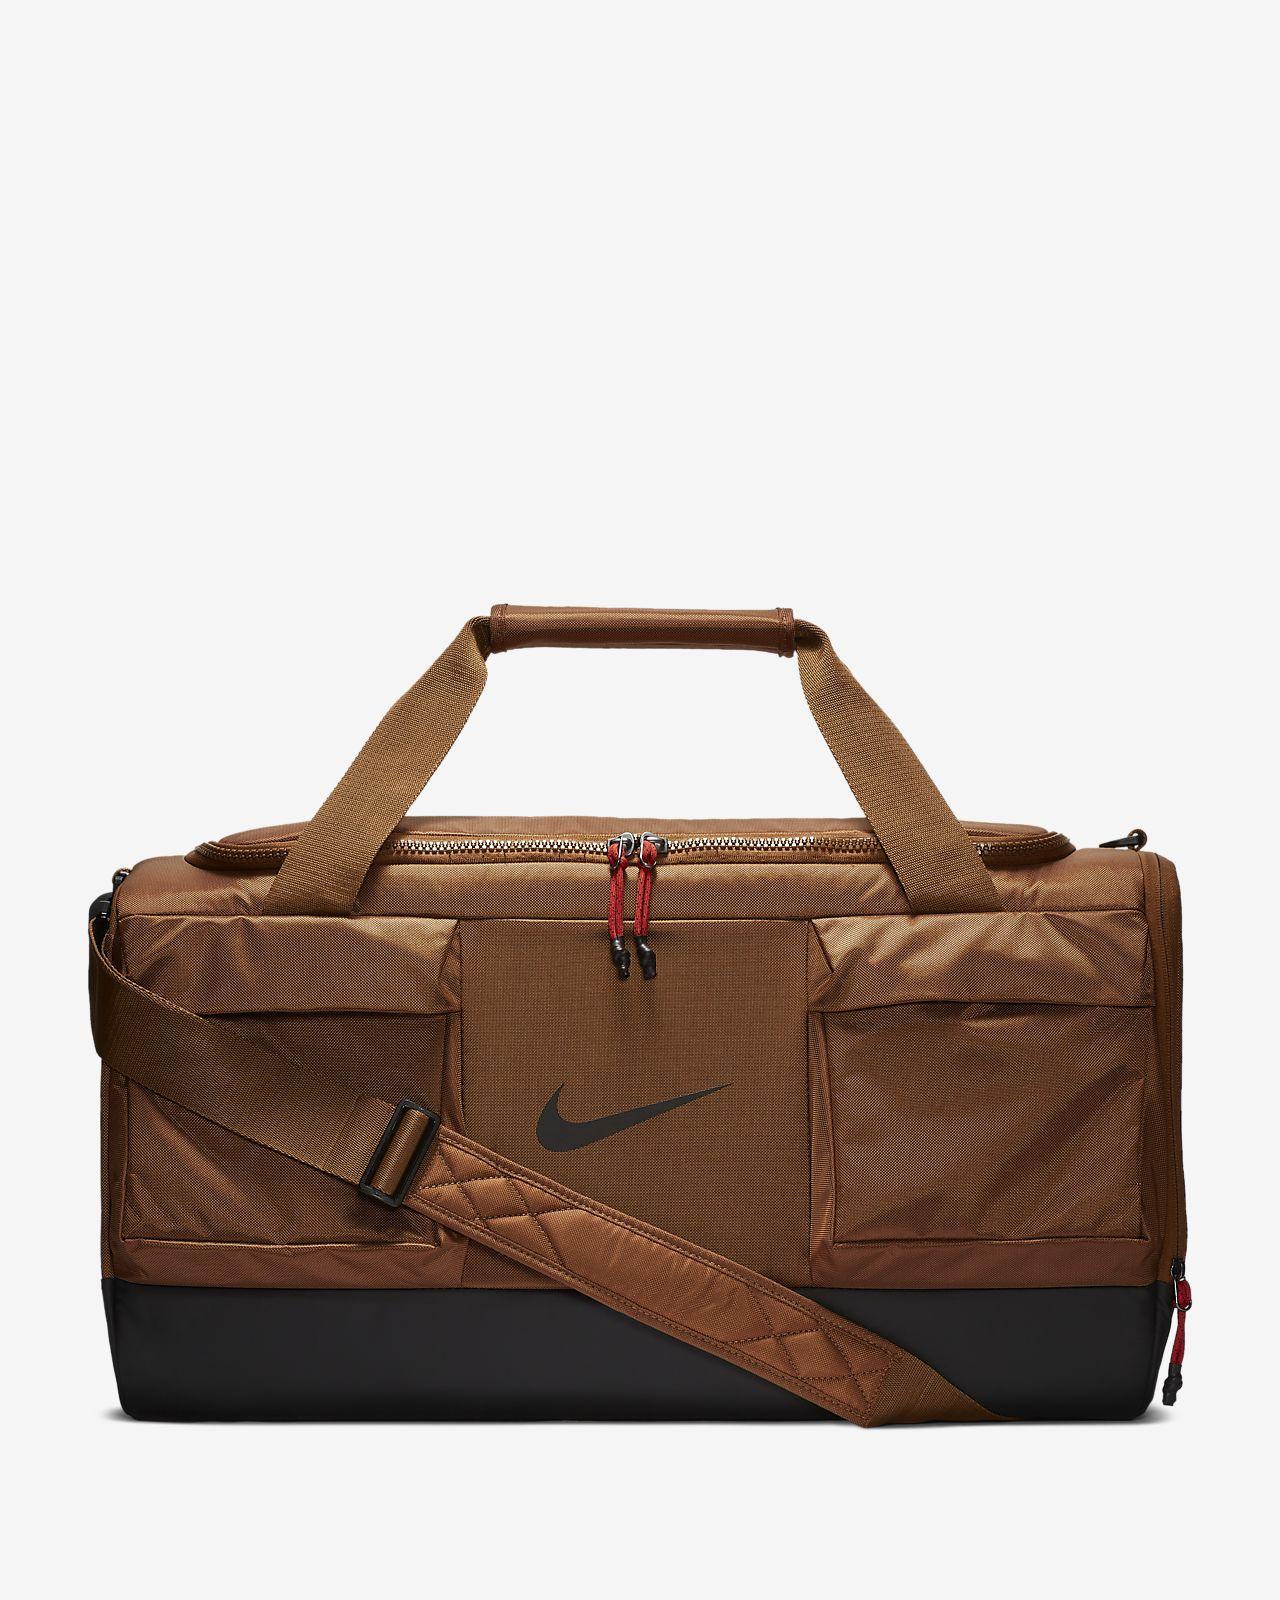 Nike Vapor Power Men s Training Duffel Bag (Medium). Nike.com LU 0724089682934